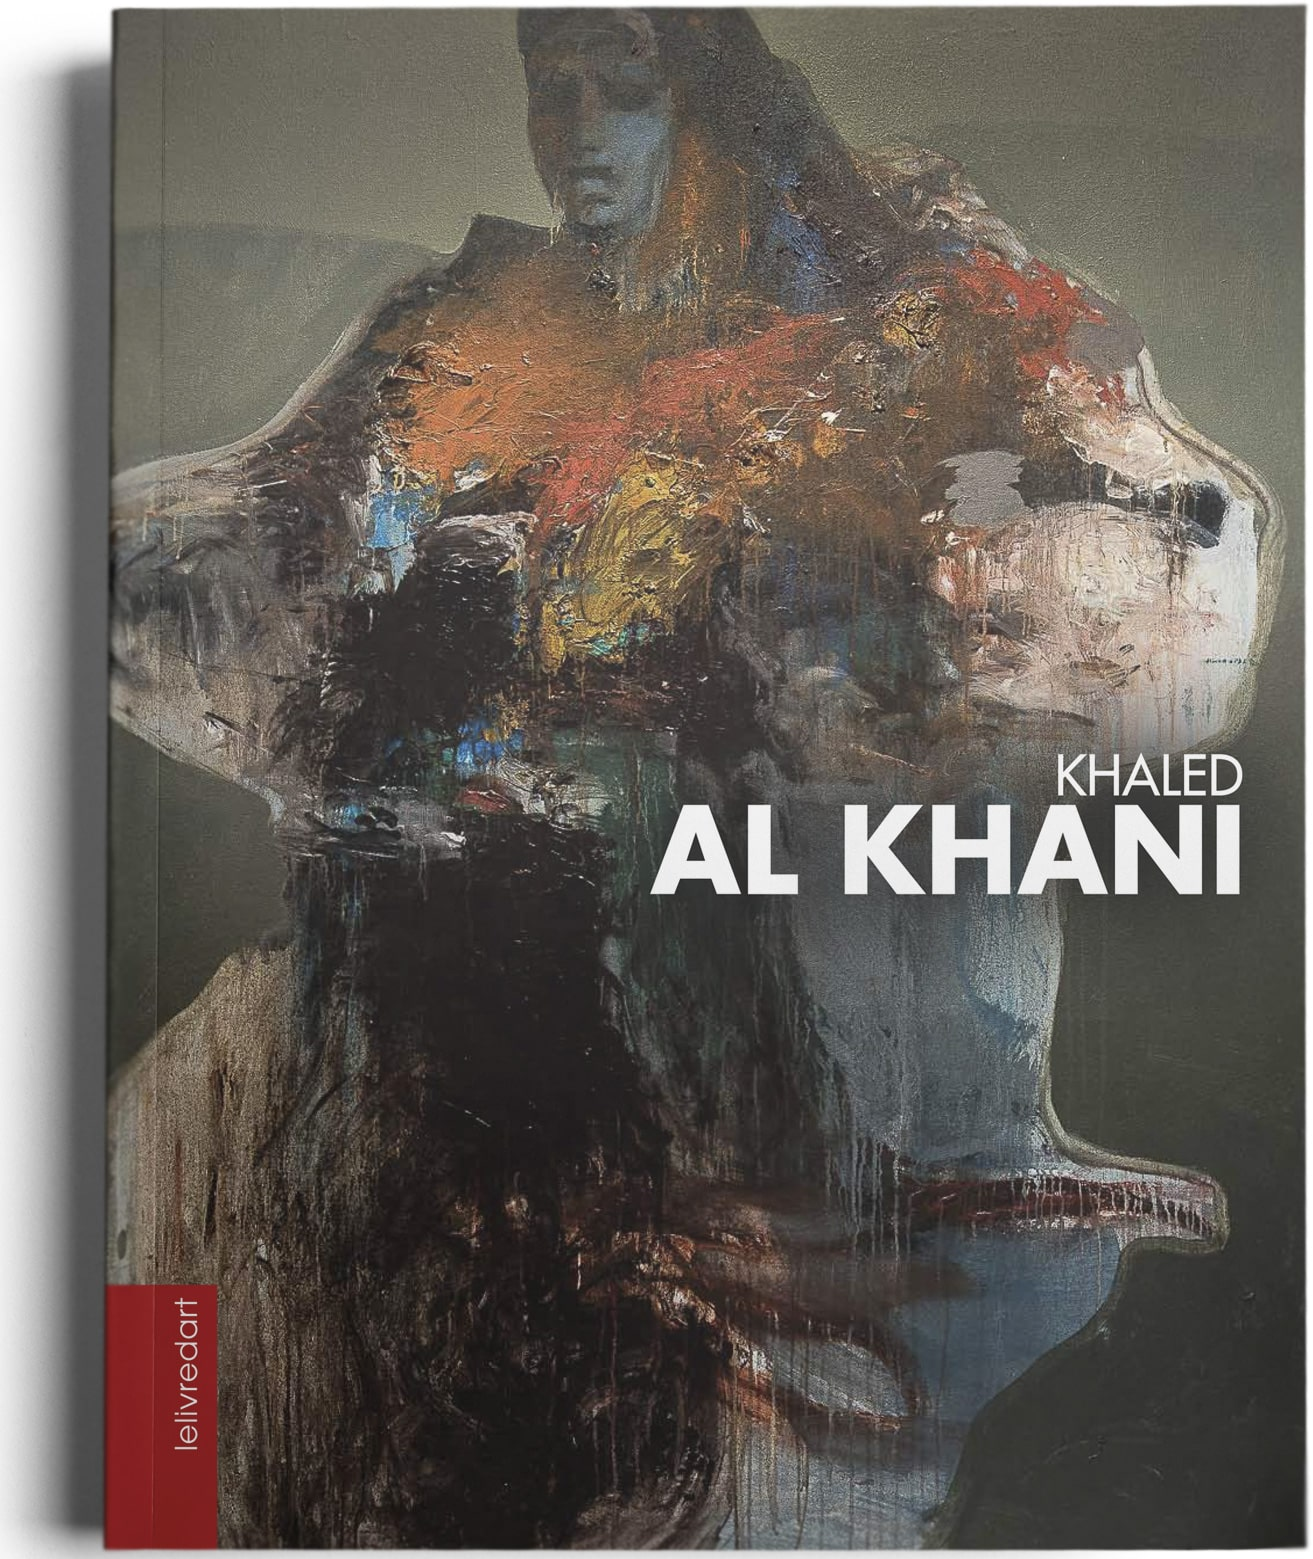 Khaled Al Khani